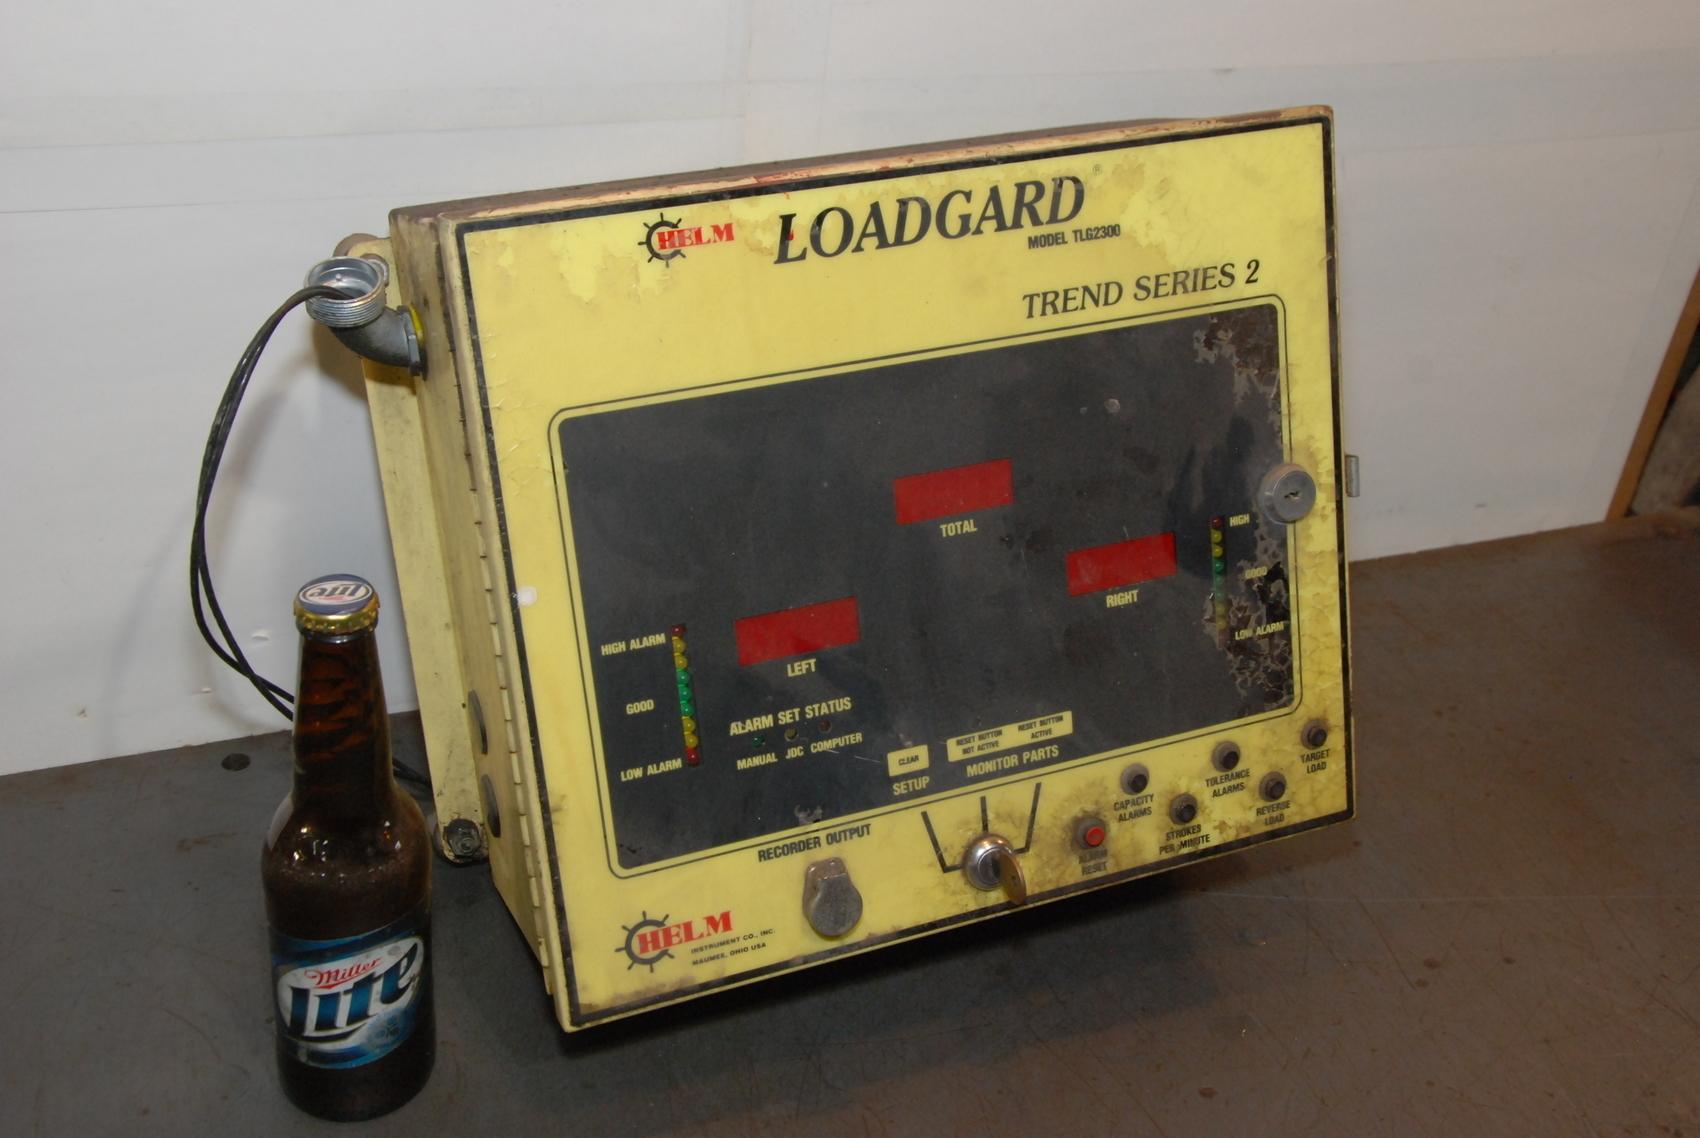 Helm Loadgard TLG2300 Trend Series 2 Tonnage Load Monitor